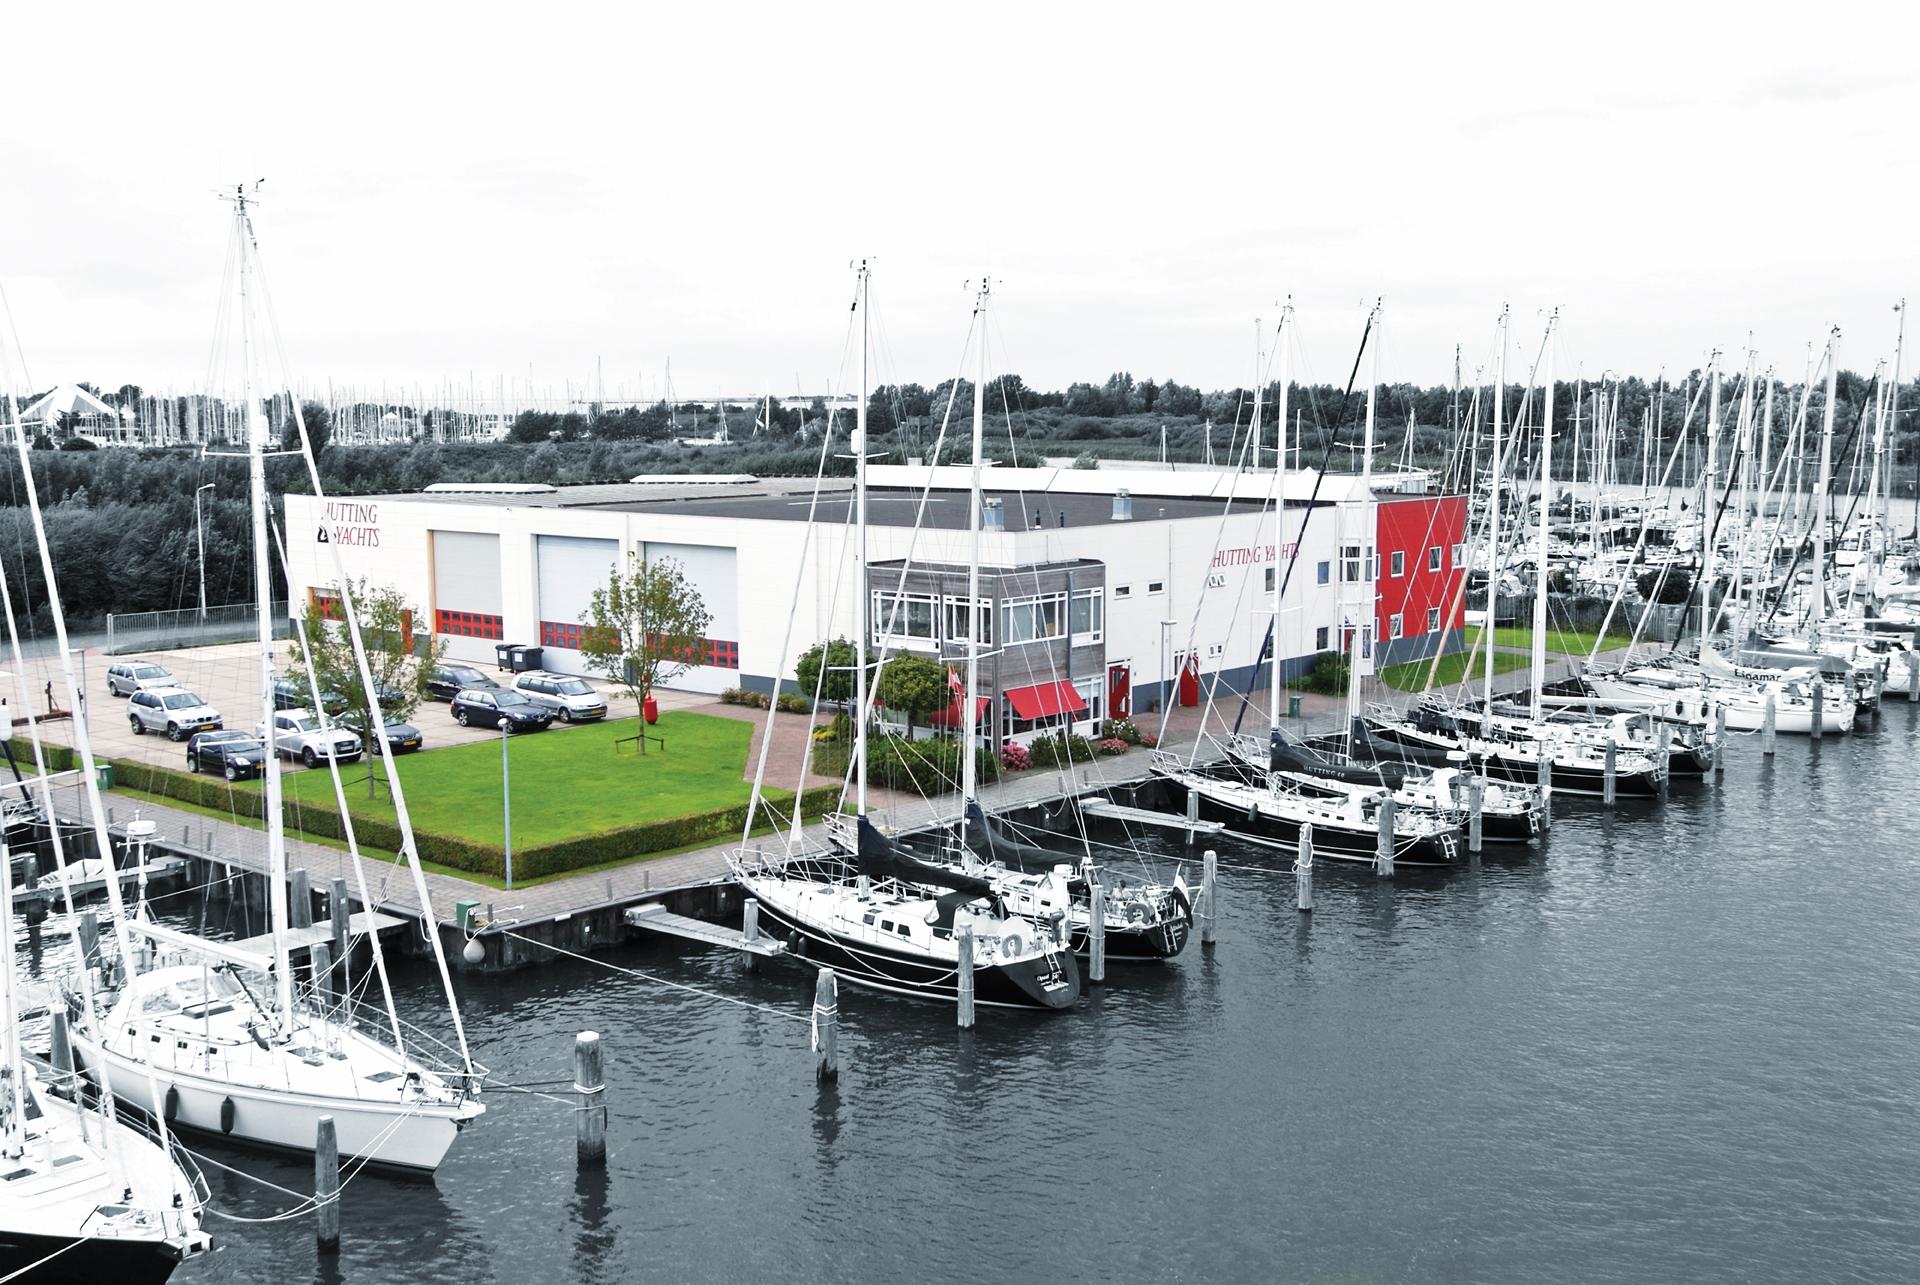 Hutting Yachts